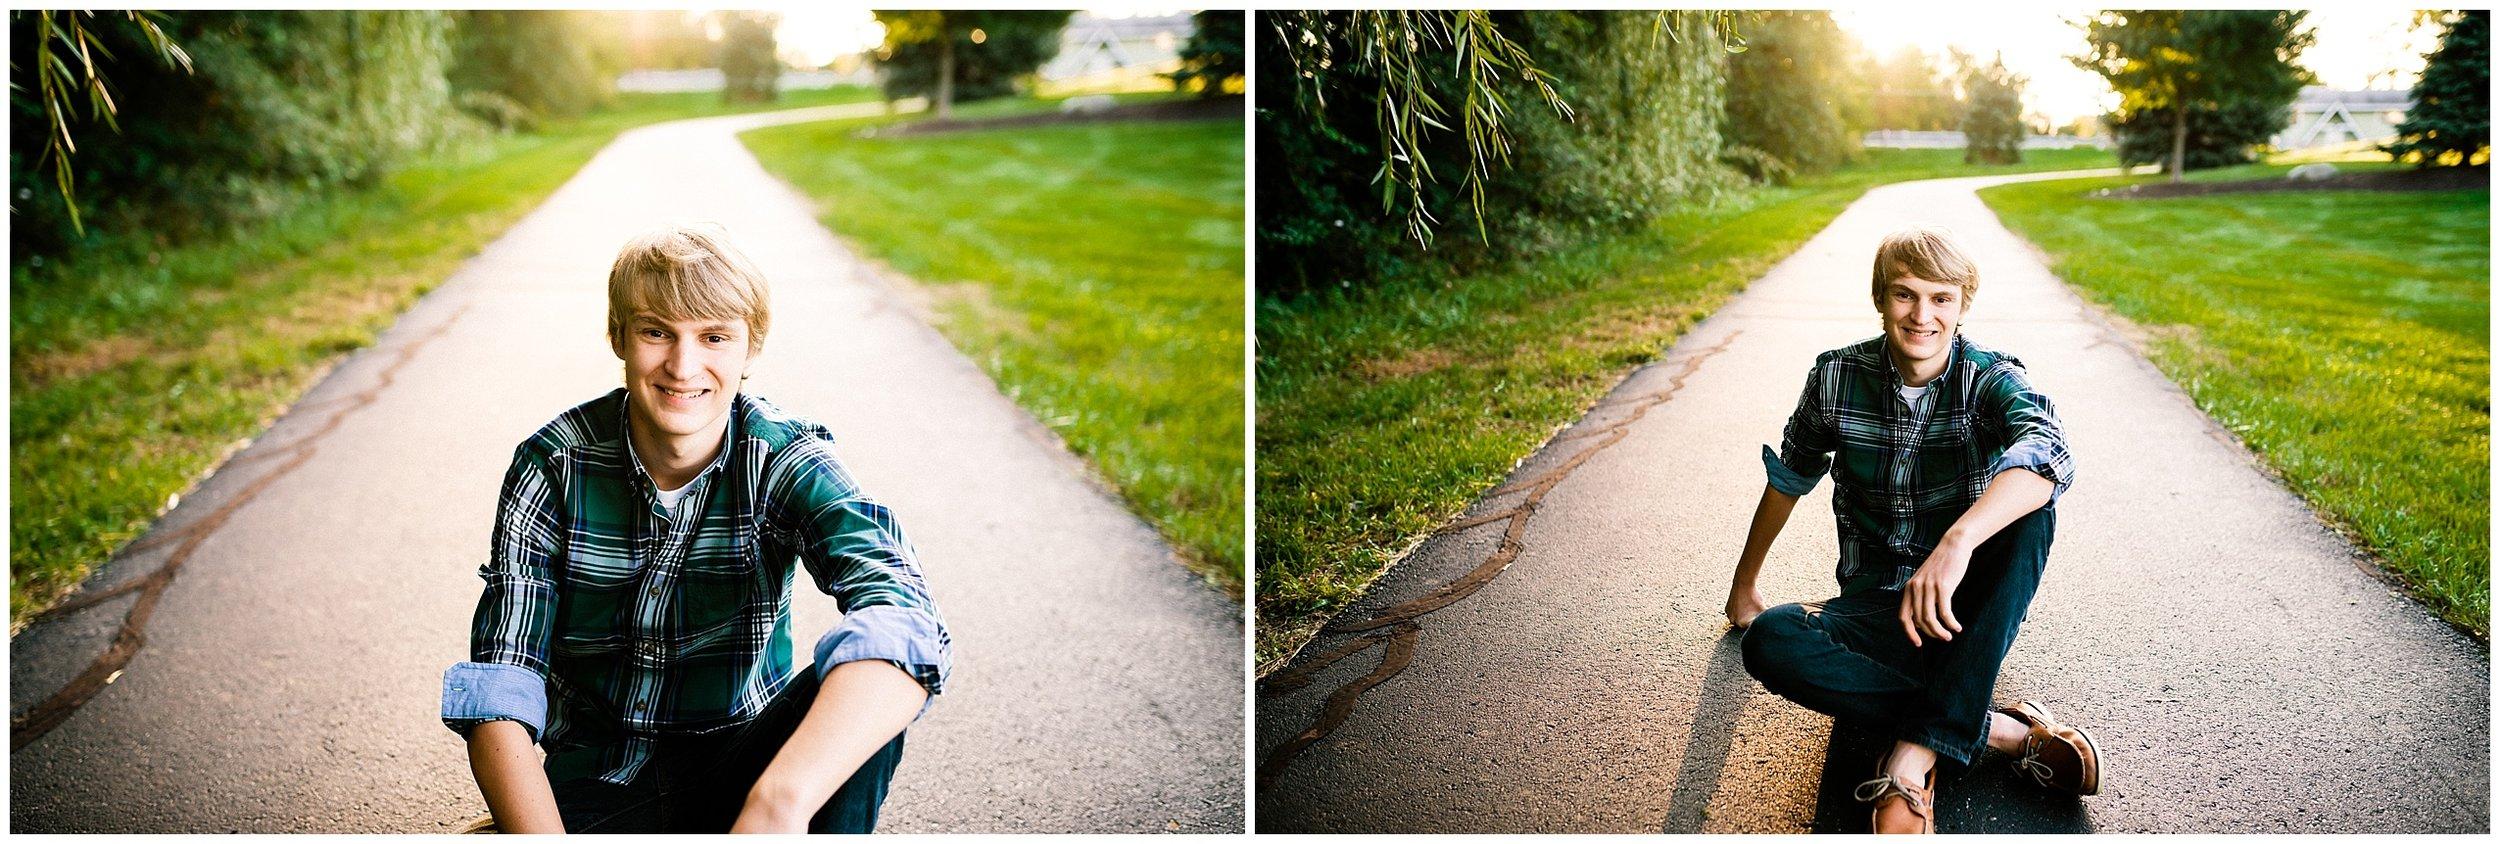 William | Senior #kyleepaigephotography_1305.jpg